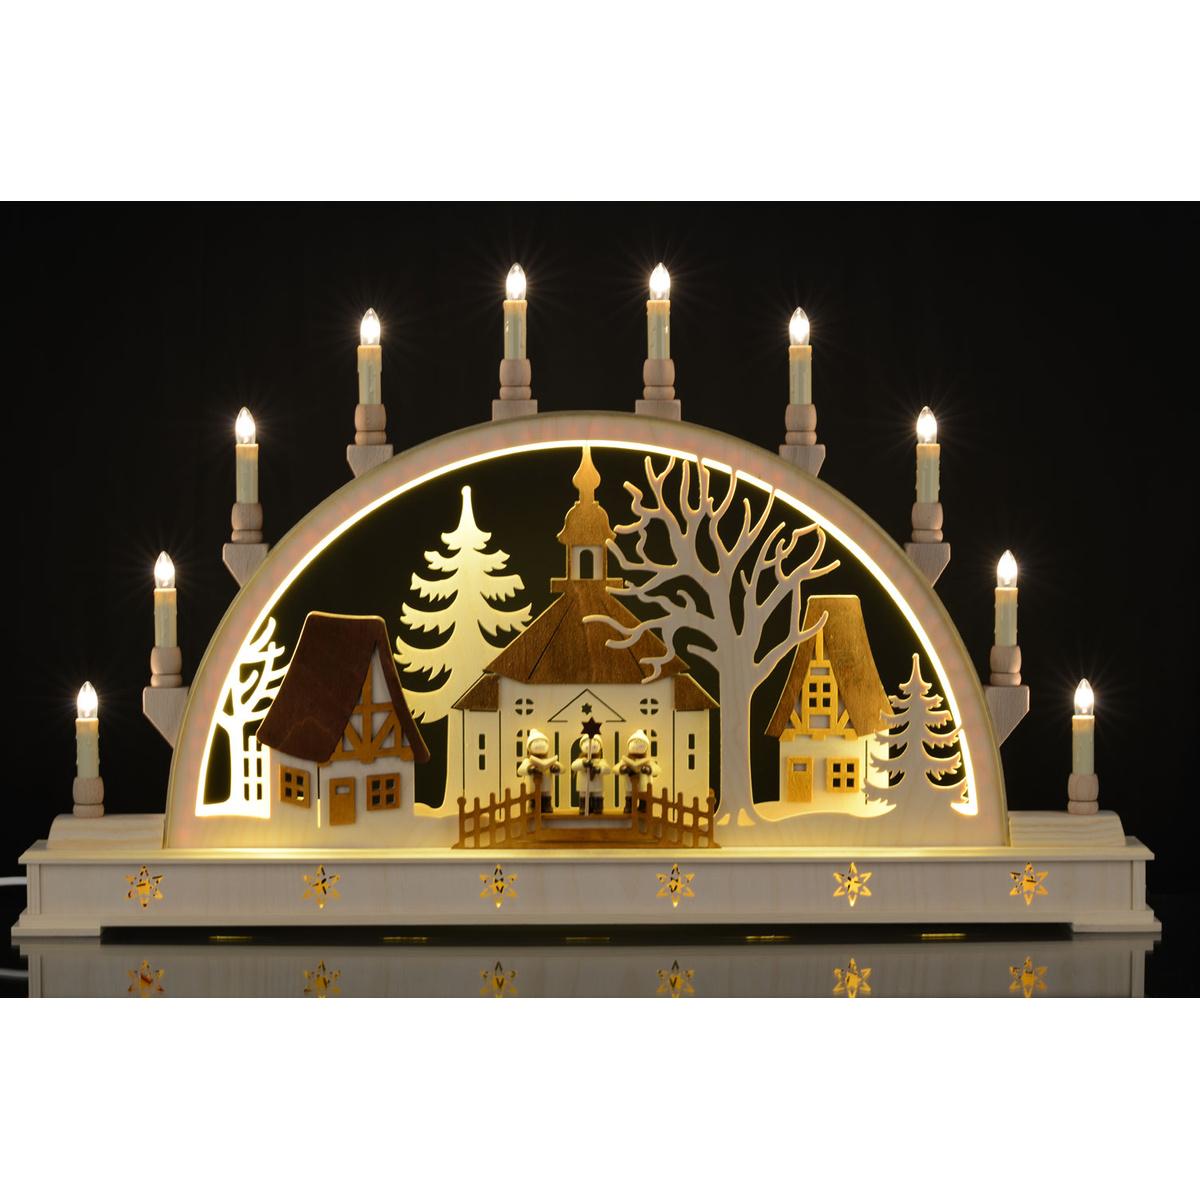 schwibbogen led beleuchtung seiffener kirche von holger seidel f r 262 1 kaufen. Black Bedroom Furniture Sets. Home Design Ideas